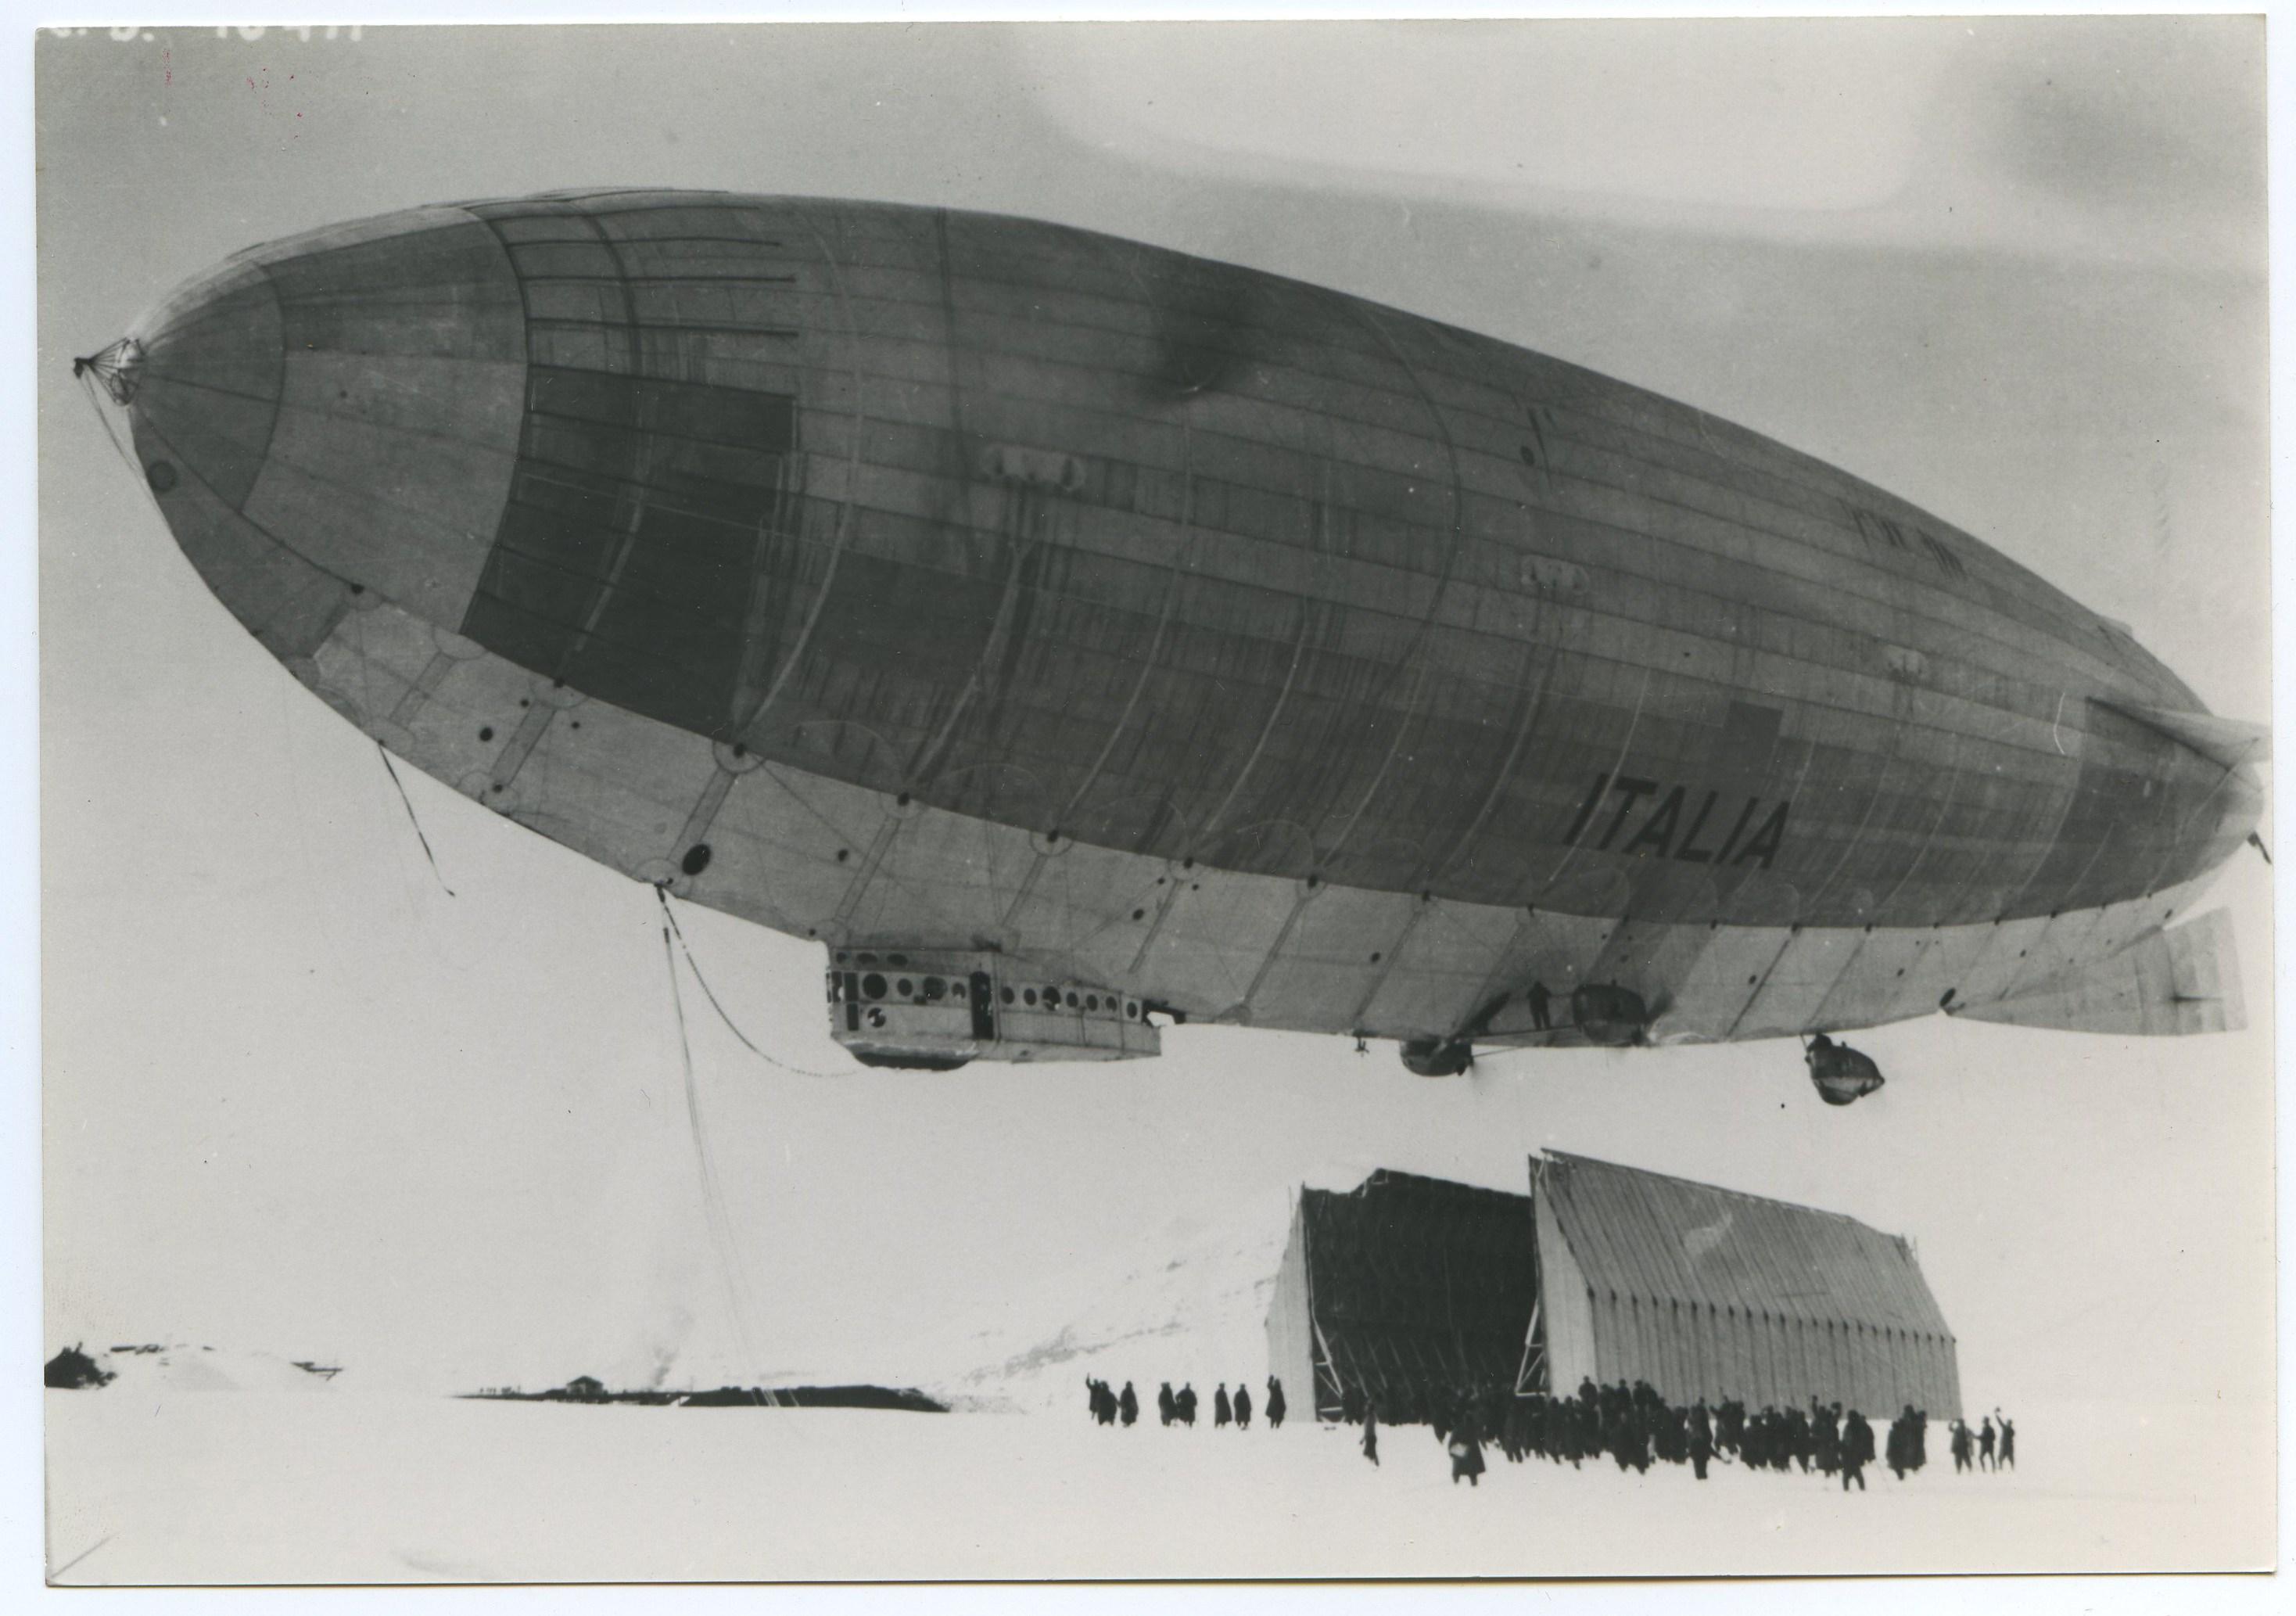 1928-umberto-nobile